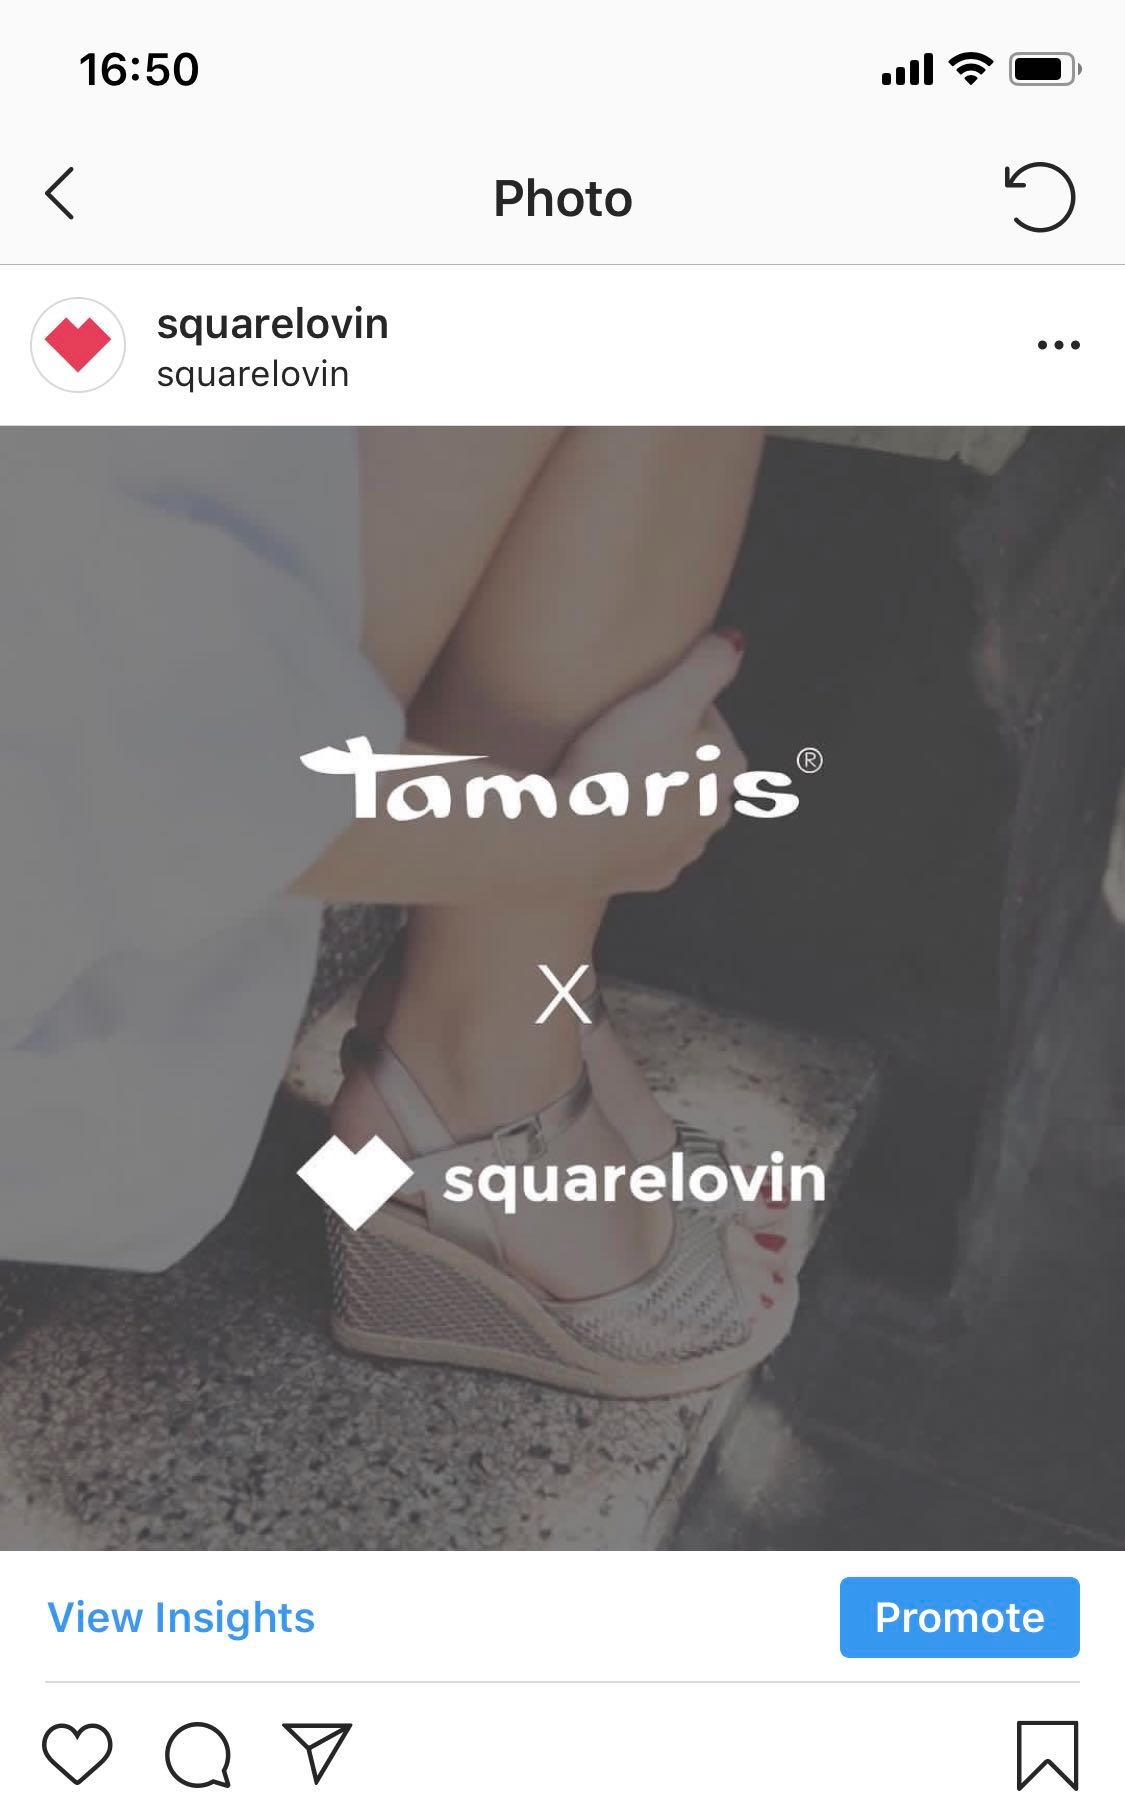 squarelovin - blog